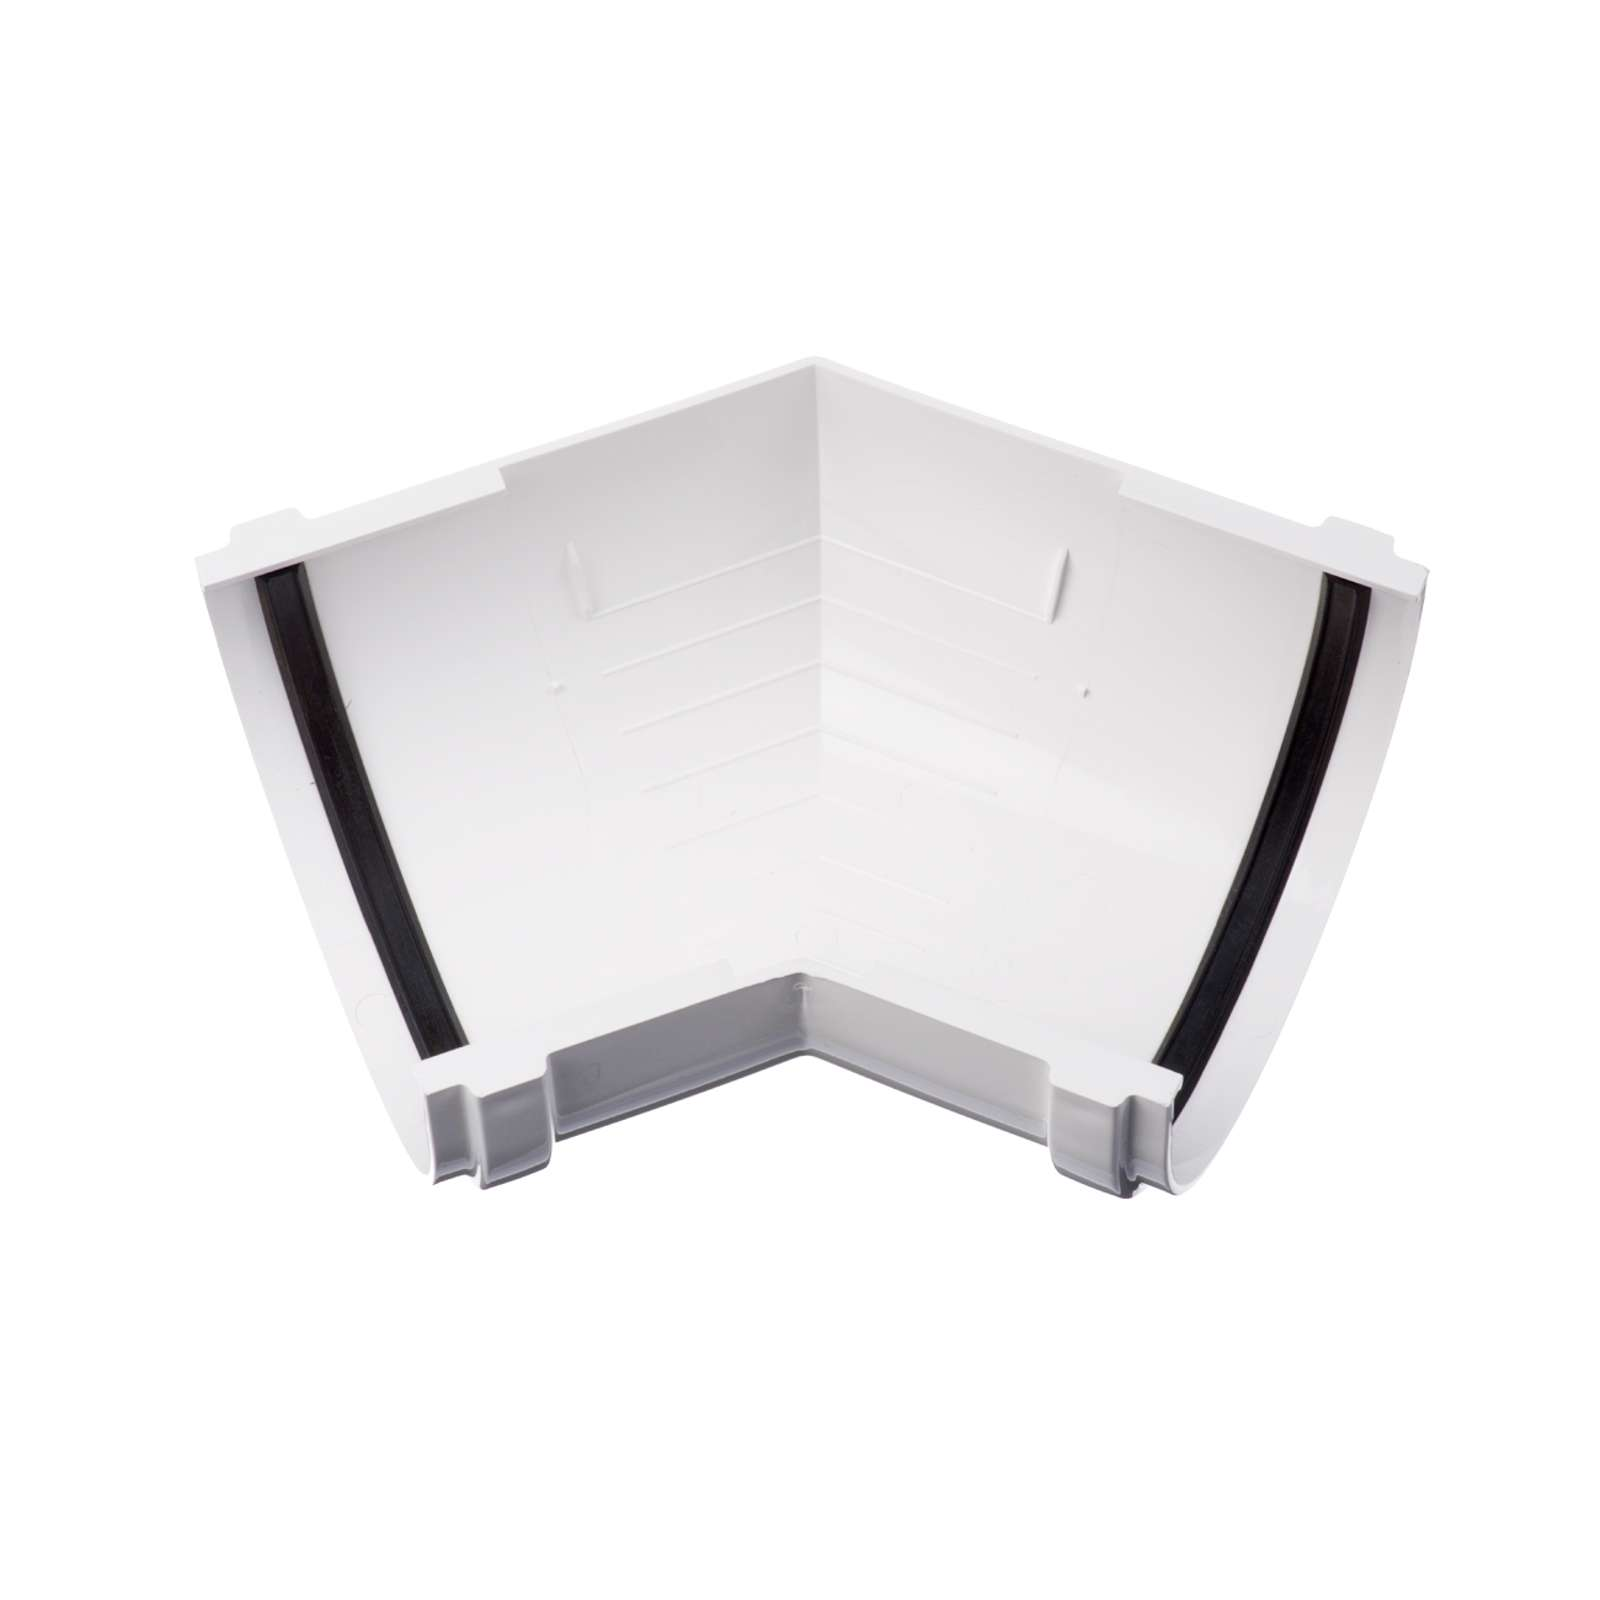 Угловой элемент желоба Docke Standart 135° Пломбир